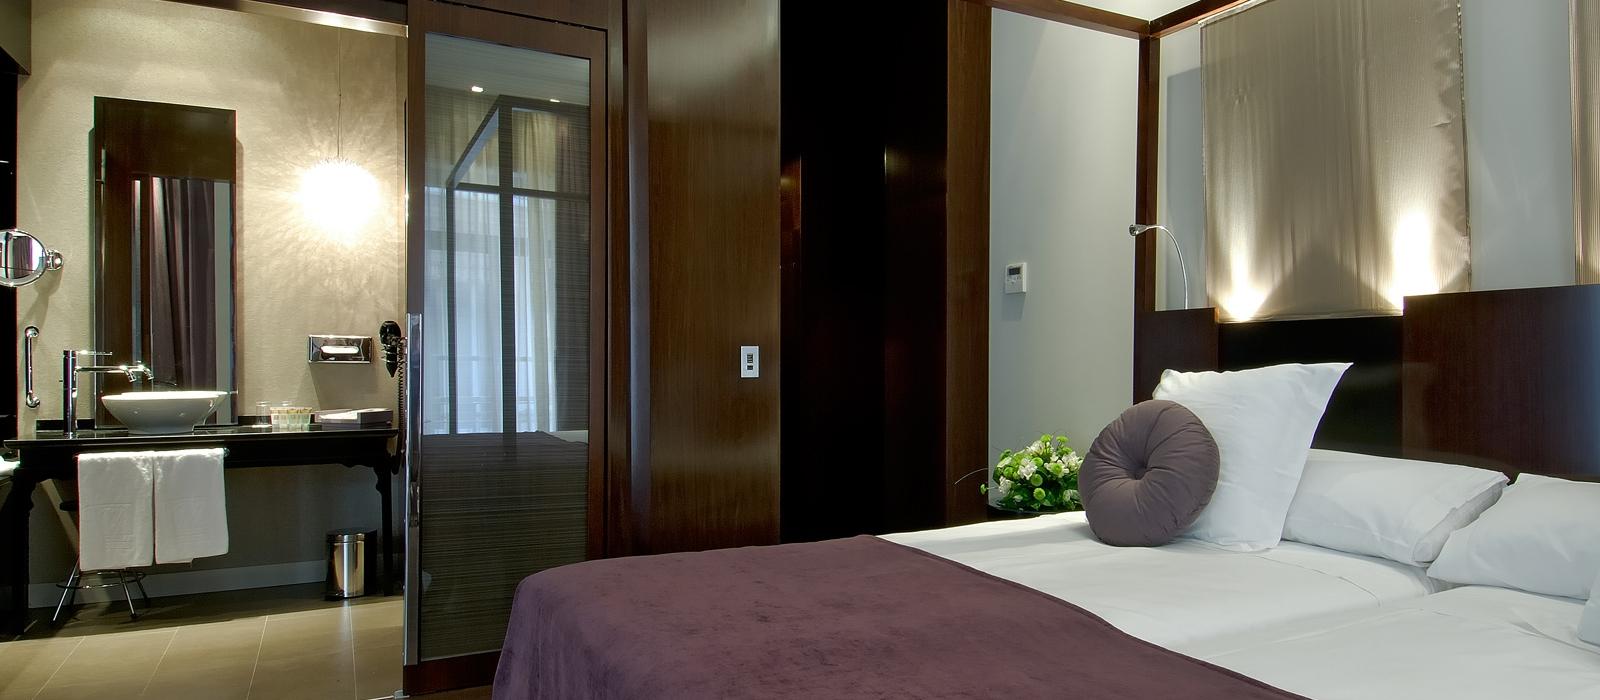 Chambre Superior Hôtel Valencia Palace - Vincci Hoteles